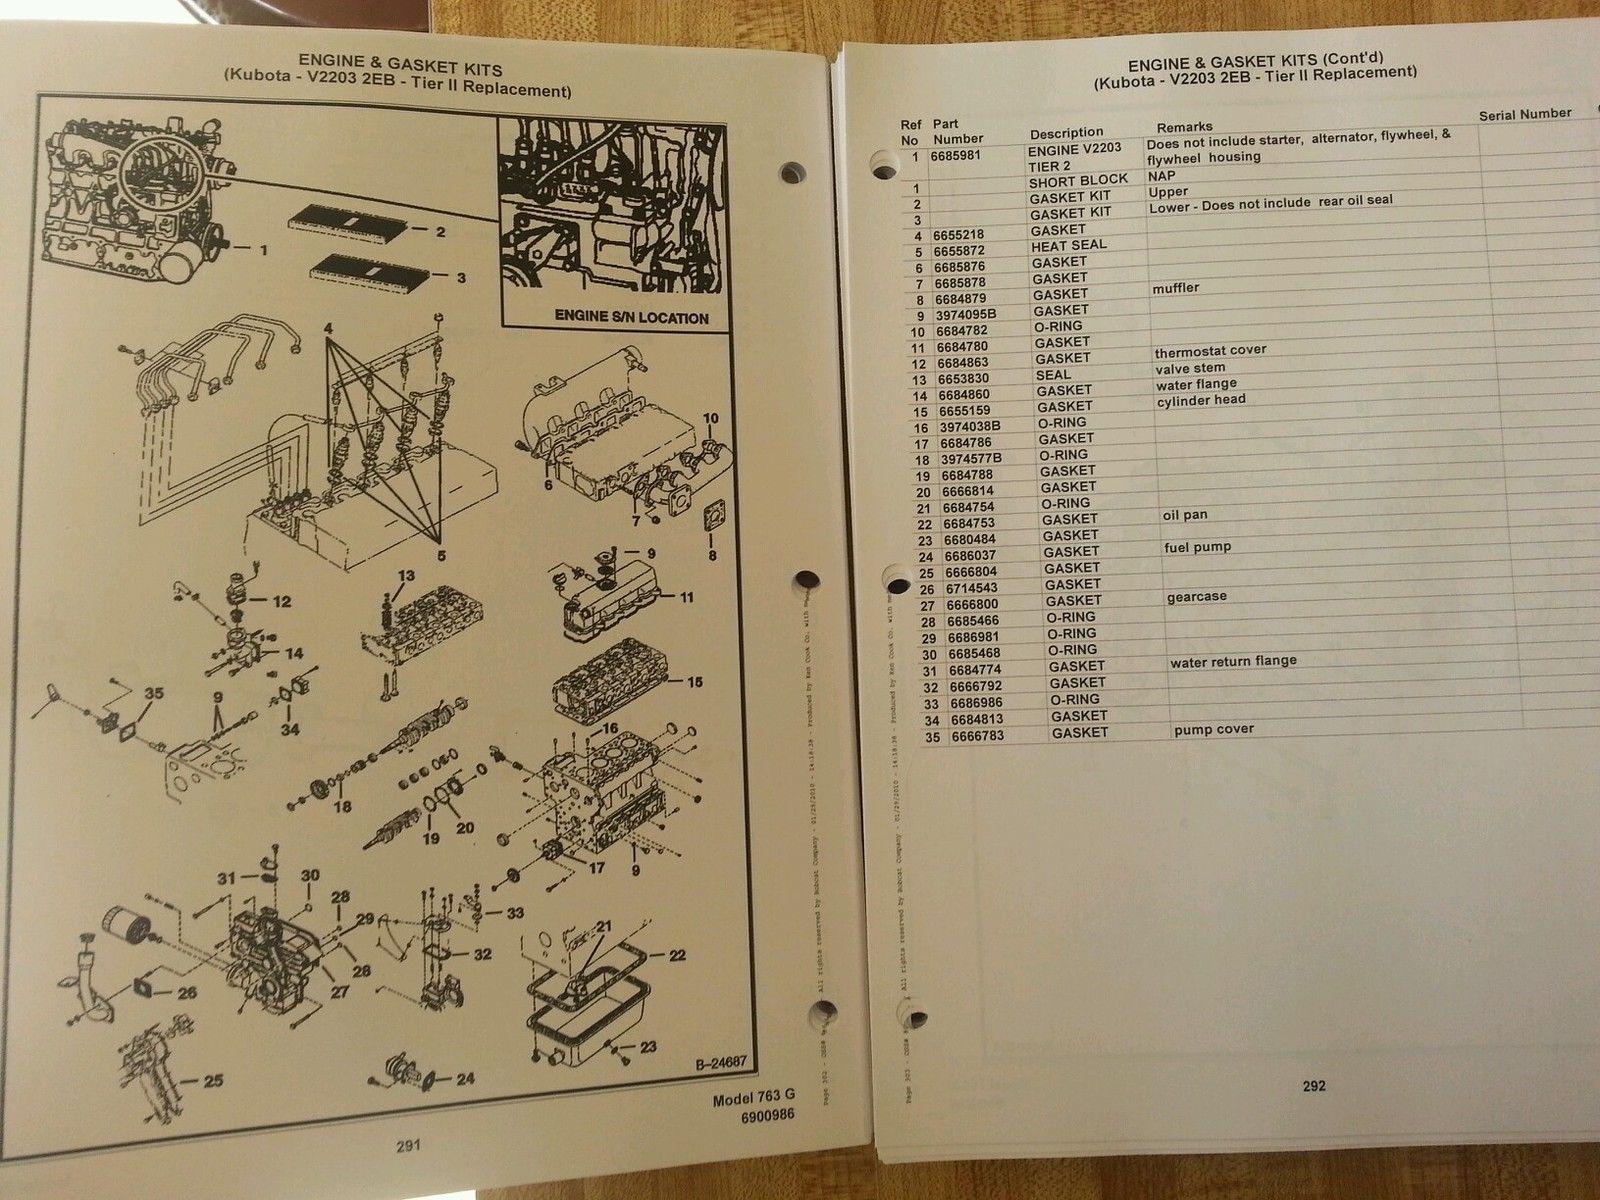 best collections of diagram bobcat 763g parts catalog download Bobcat 763 Wiring Diagram bobcat 763 763g skid steer parts manual book 6900986 finney bobcat 763 wiring diagram